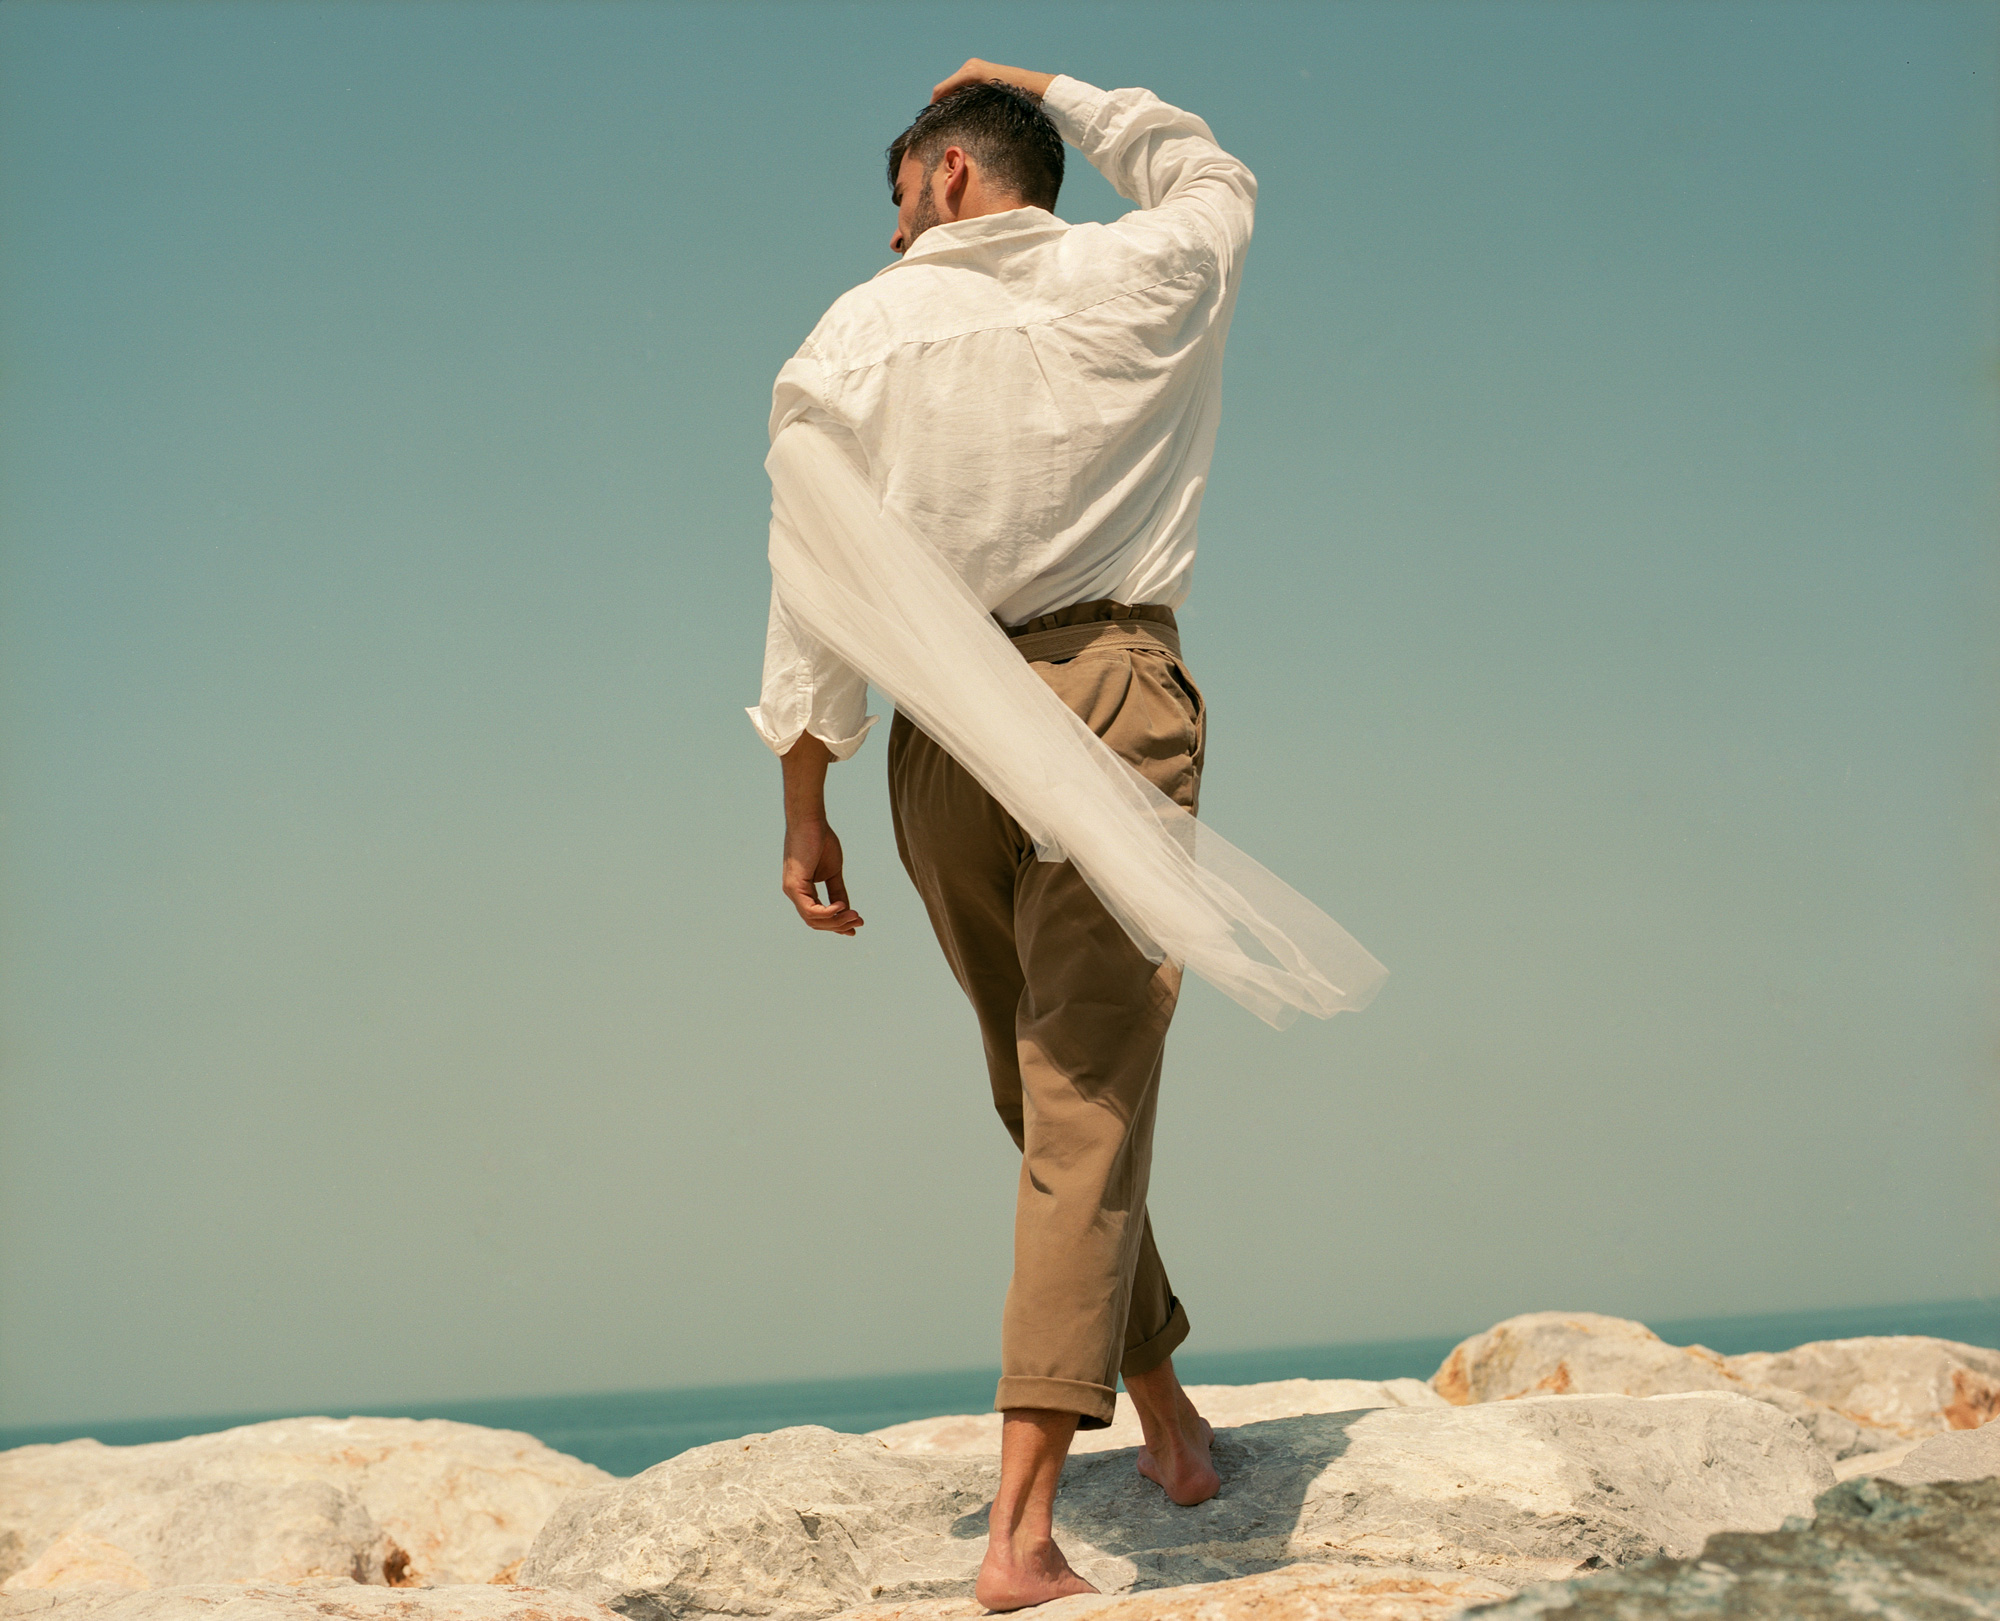 Slavko Moljac in the sea Dubai. In The Odyssey Of Mr Crusoe feature for Lewis Magazine, Photography By Ioannis Koussertari